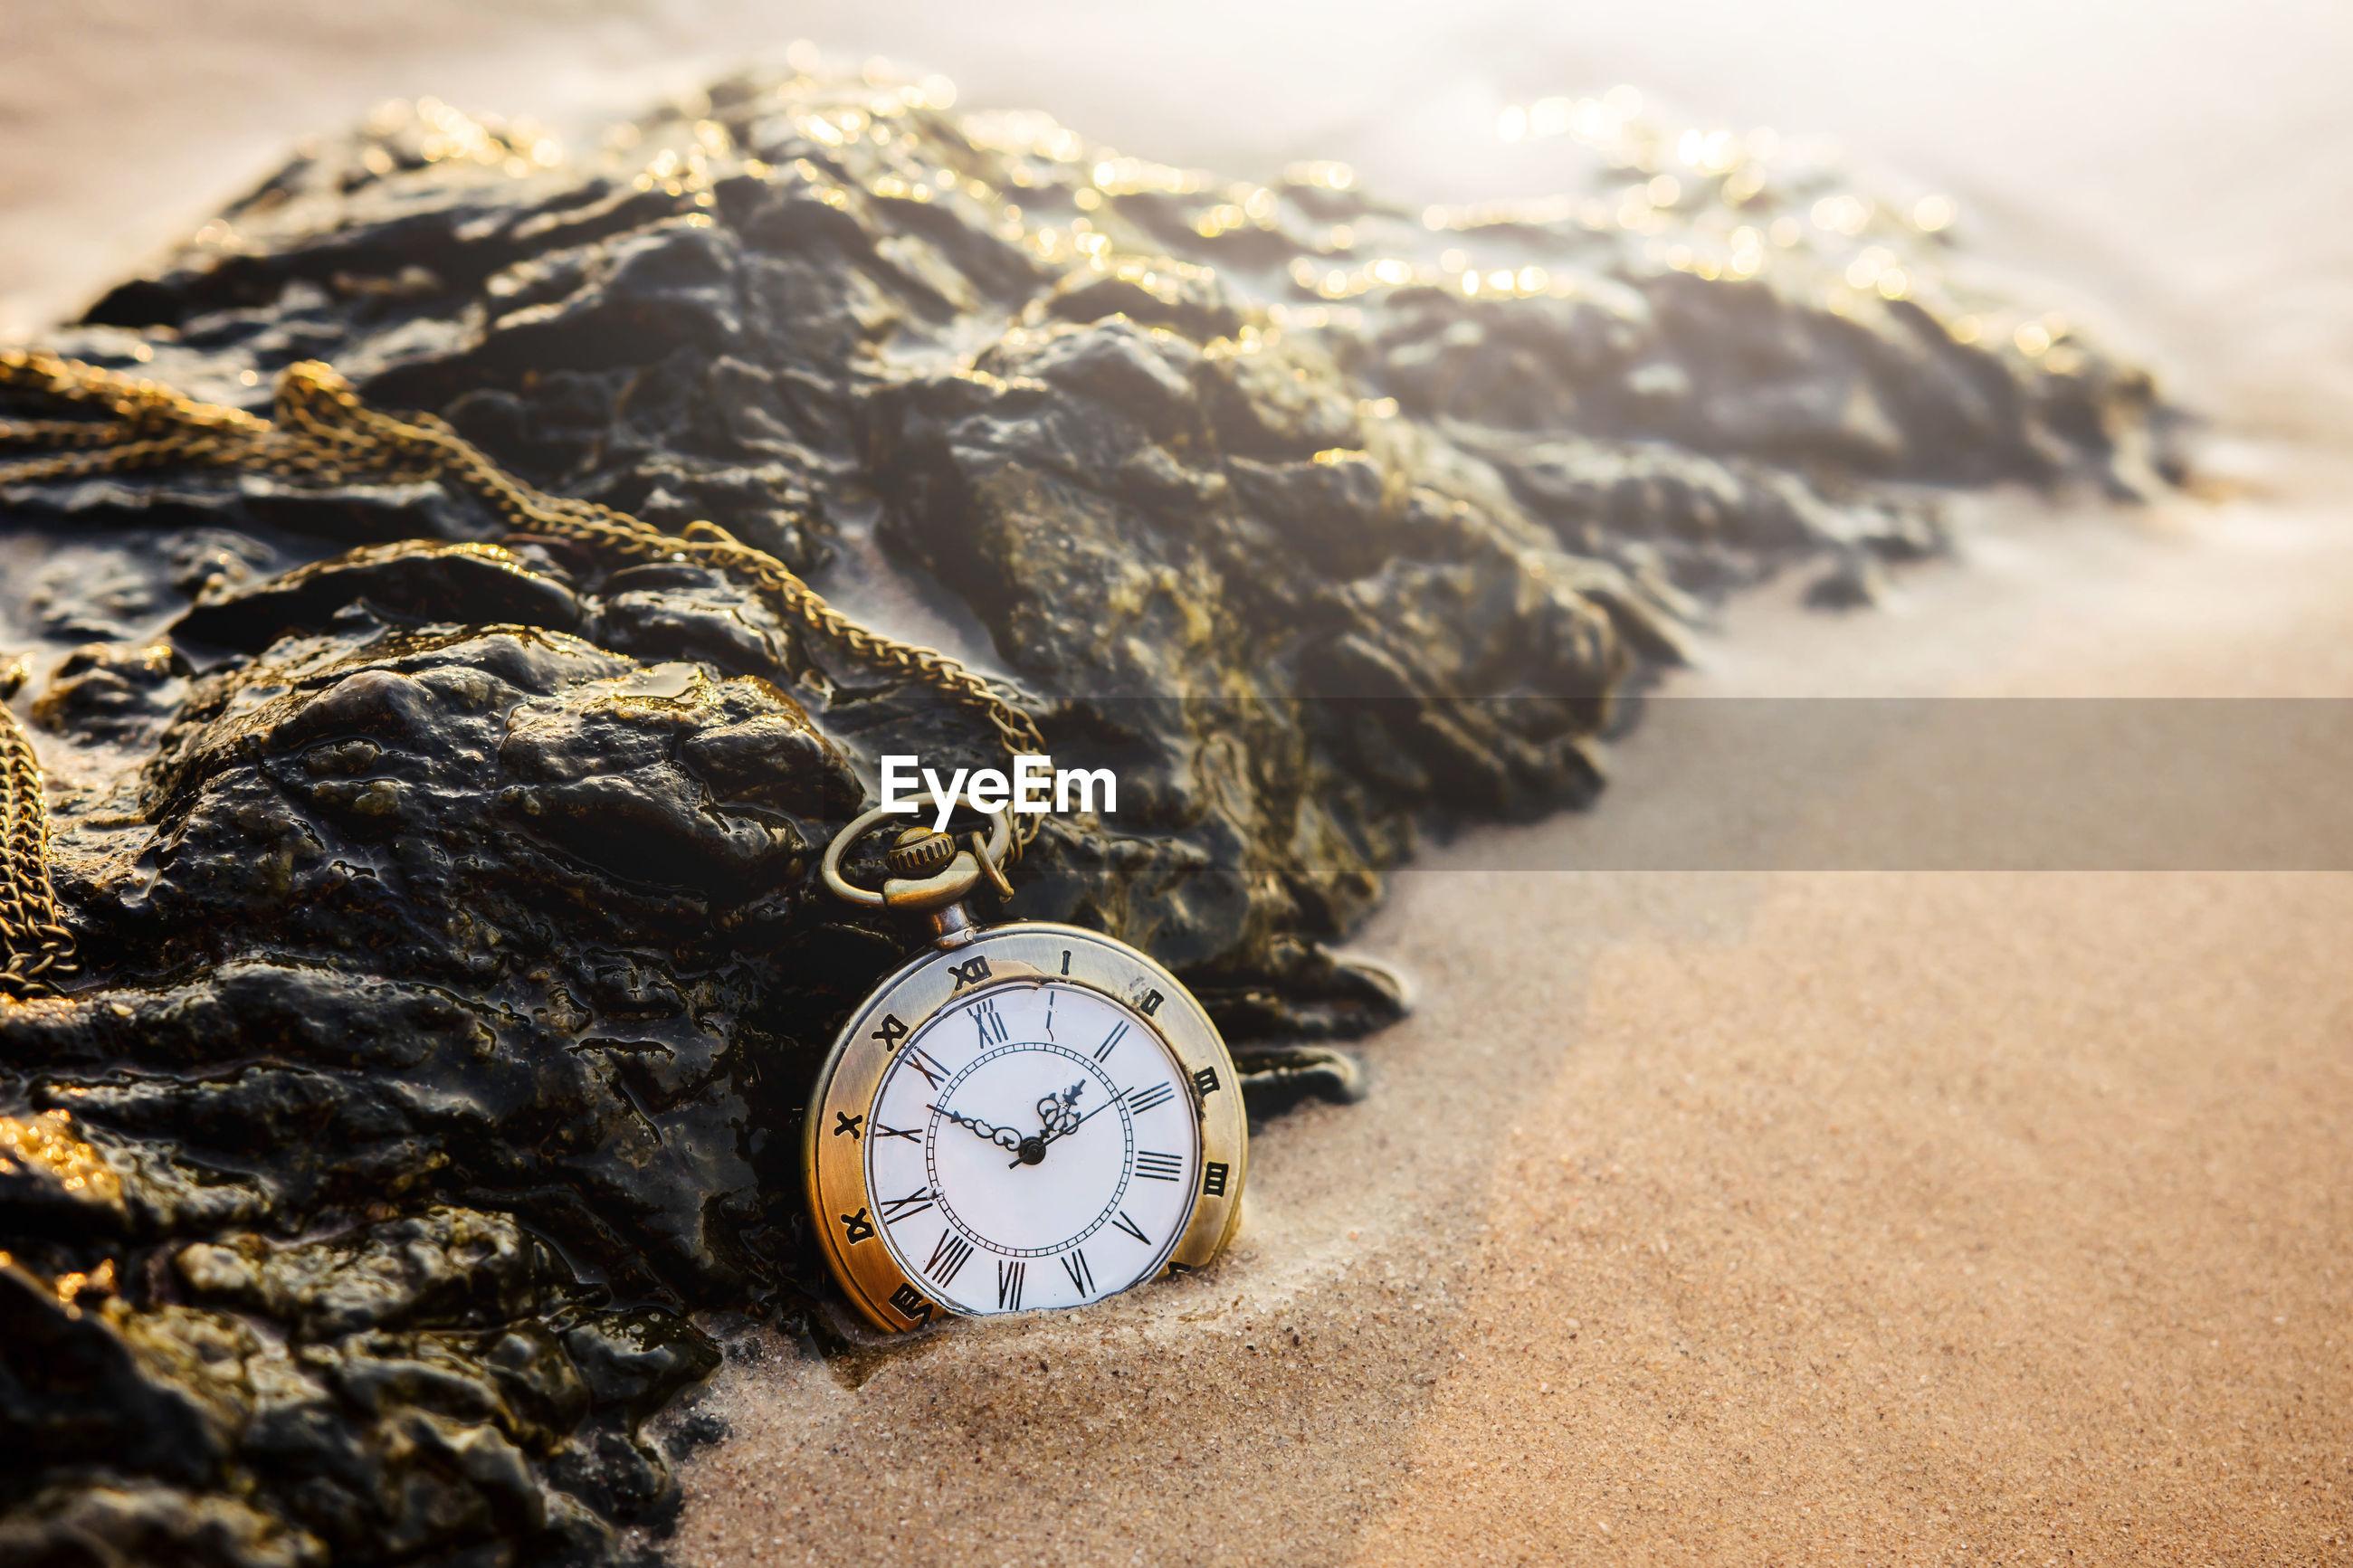 Close-up of clock pendant on sand